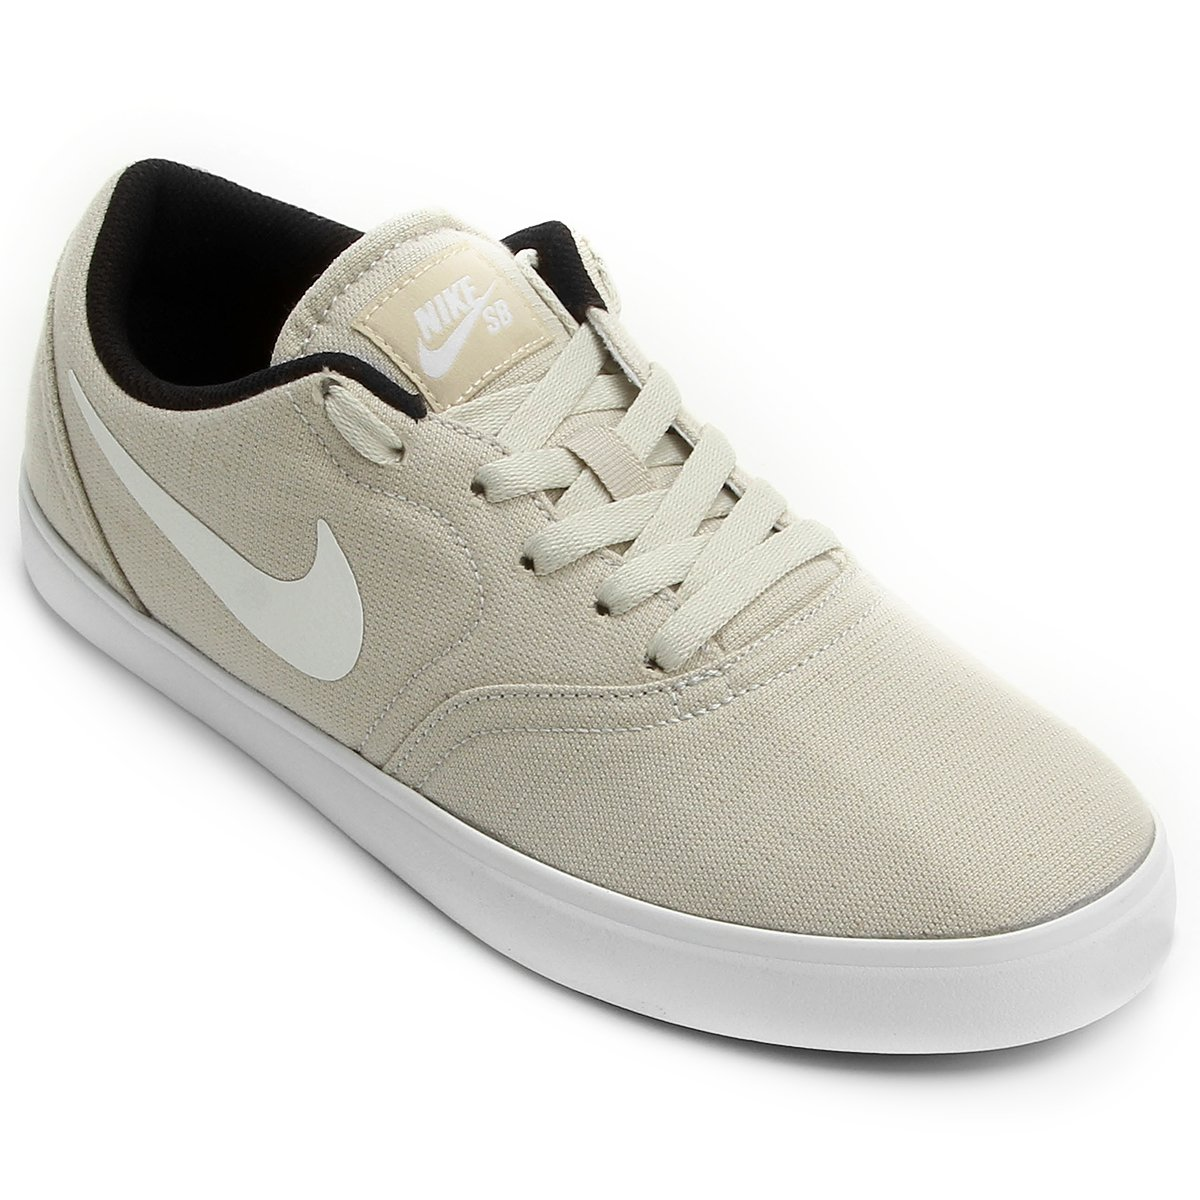 b5d39d1f6 Tênis Nike SB Check Canvas - Compre Agora